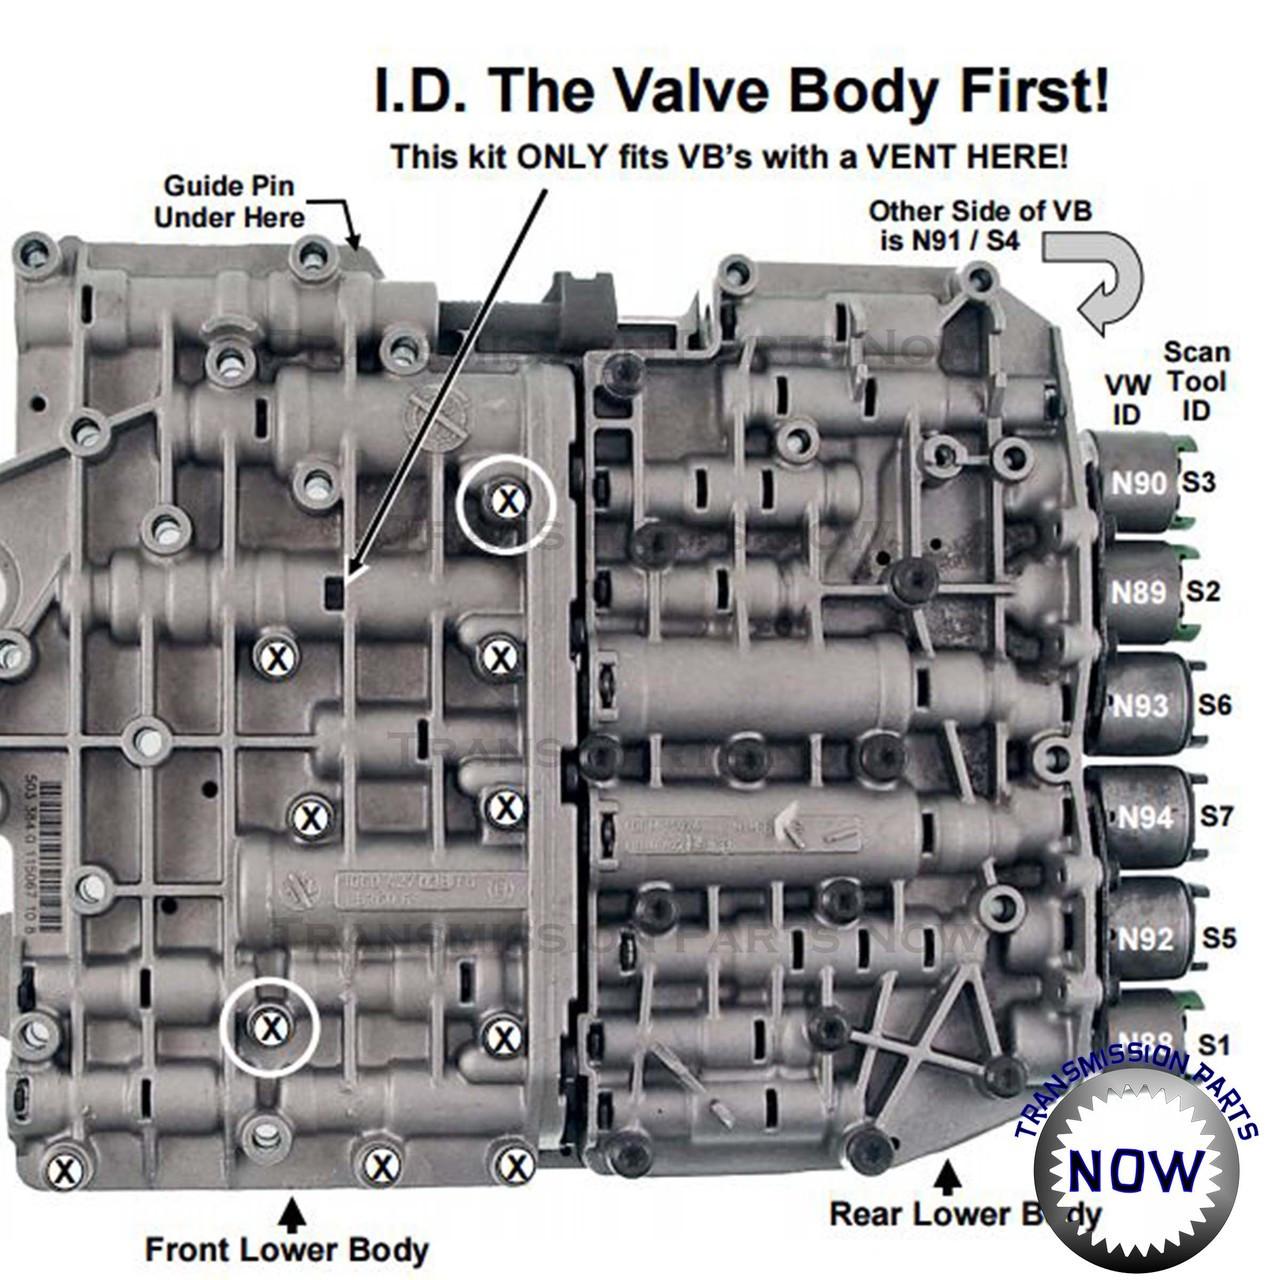 ZF5-19-PR, ZF5HP19, Transgo, Pressure regulator valve